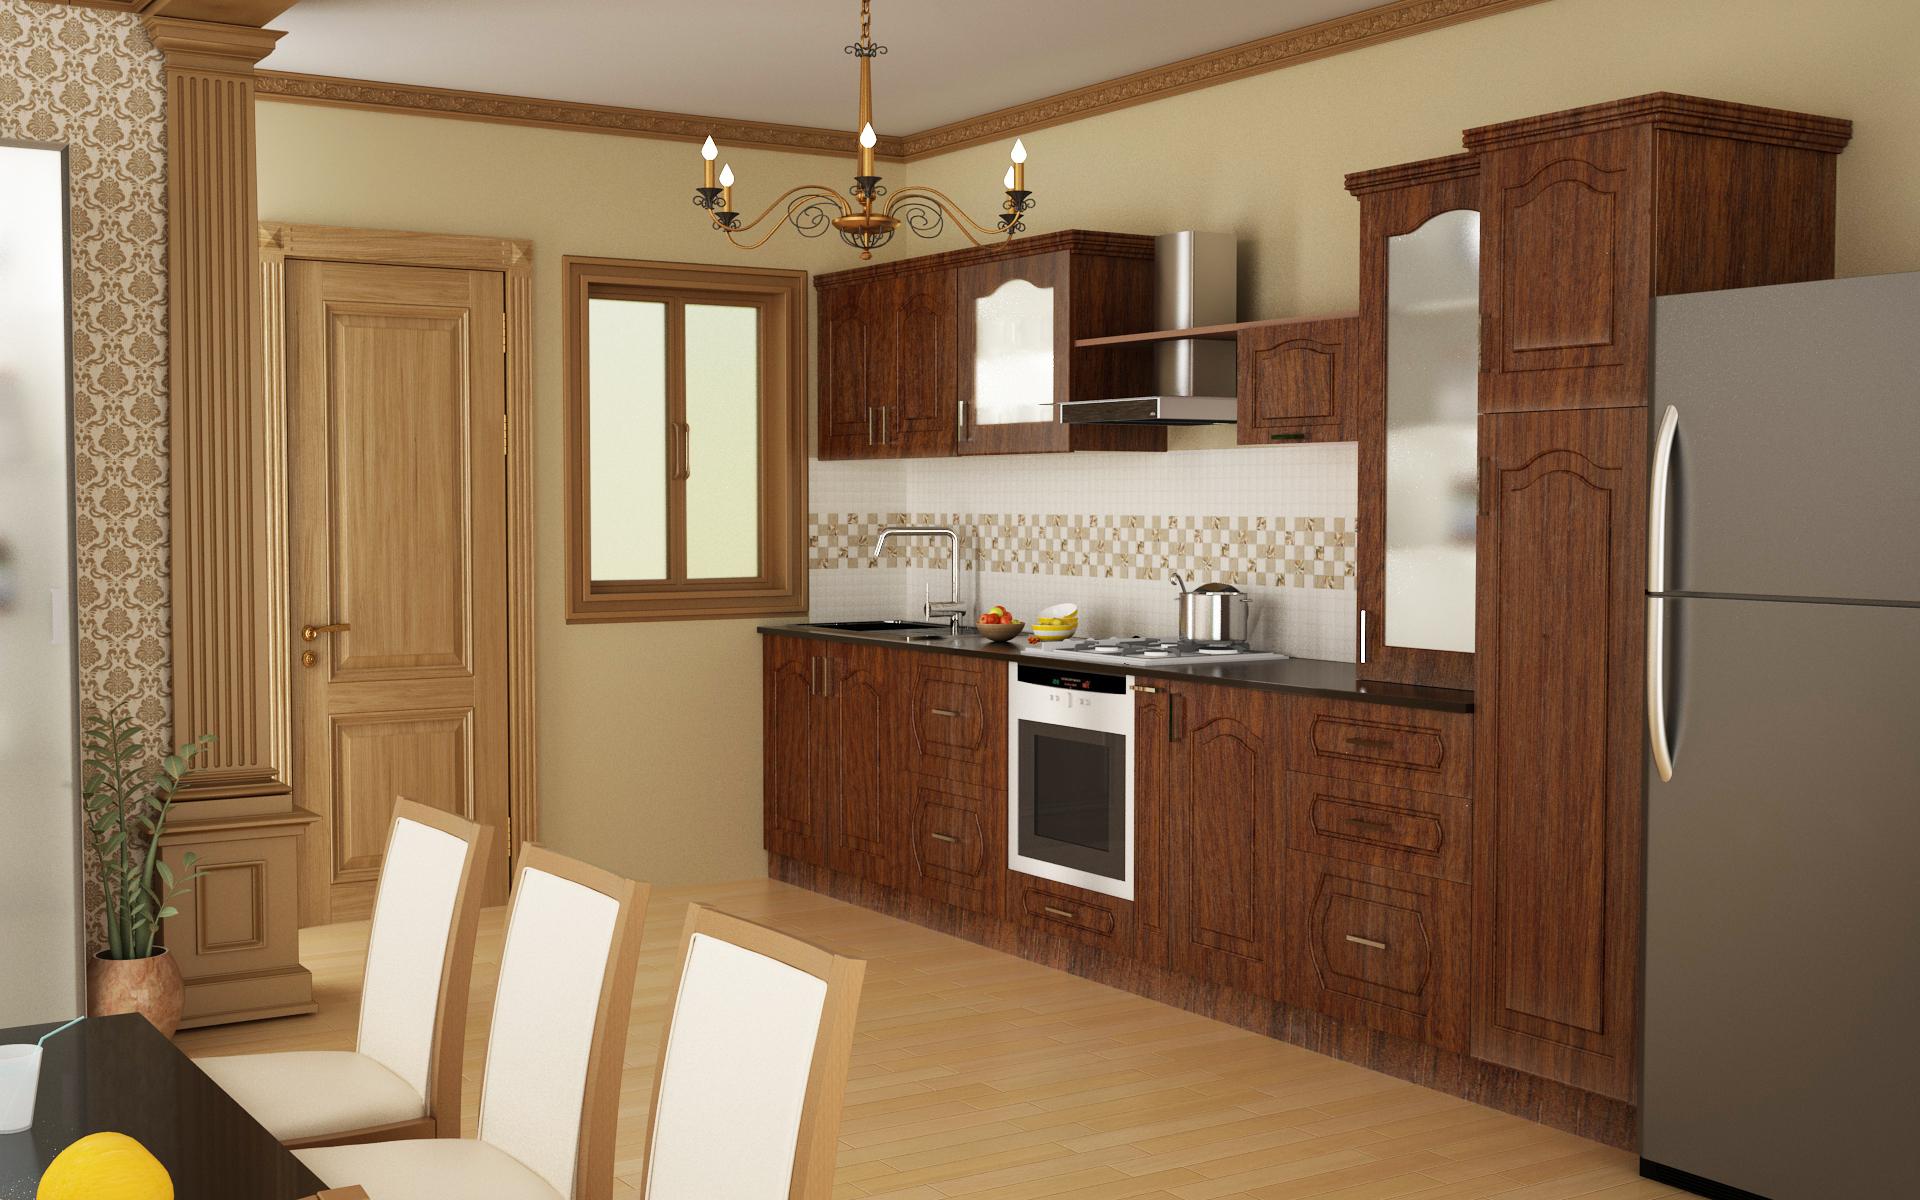 Design tips the straight kitchen homelane - Straight line kitchen designs ...